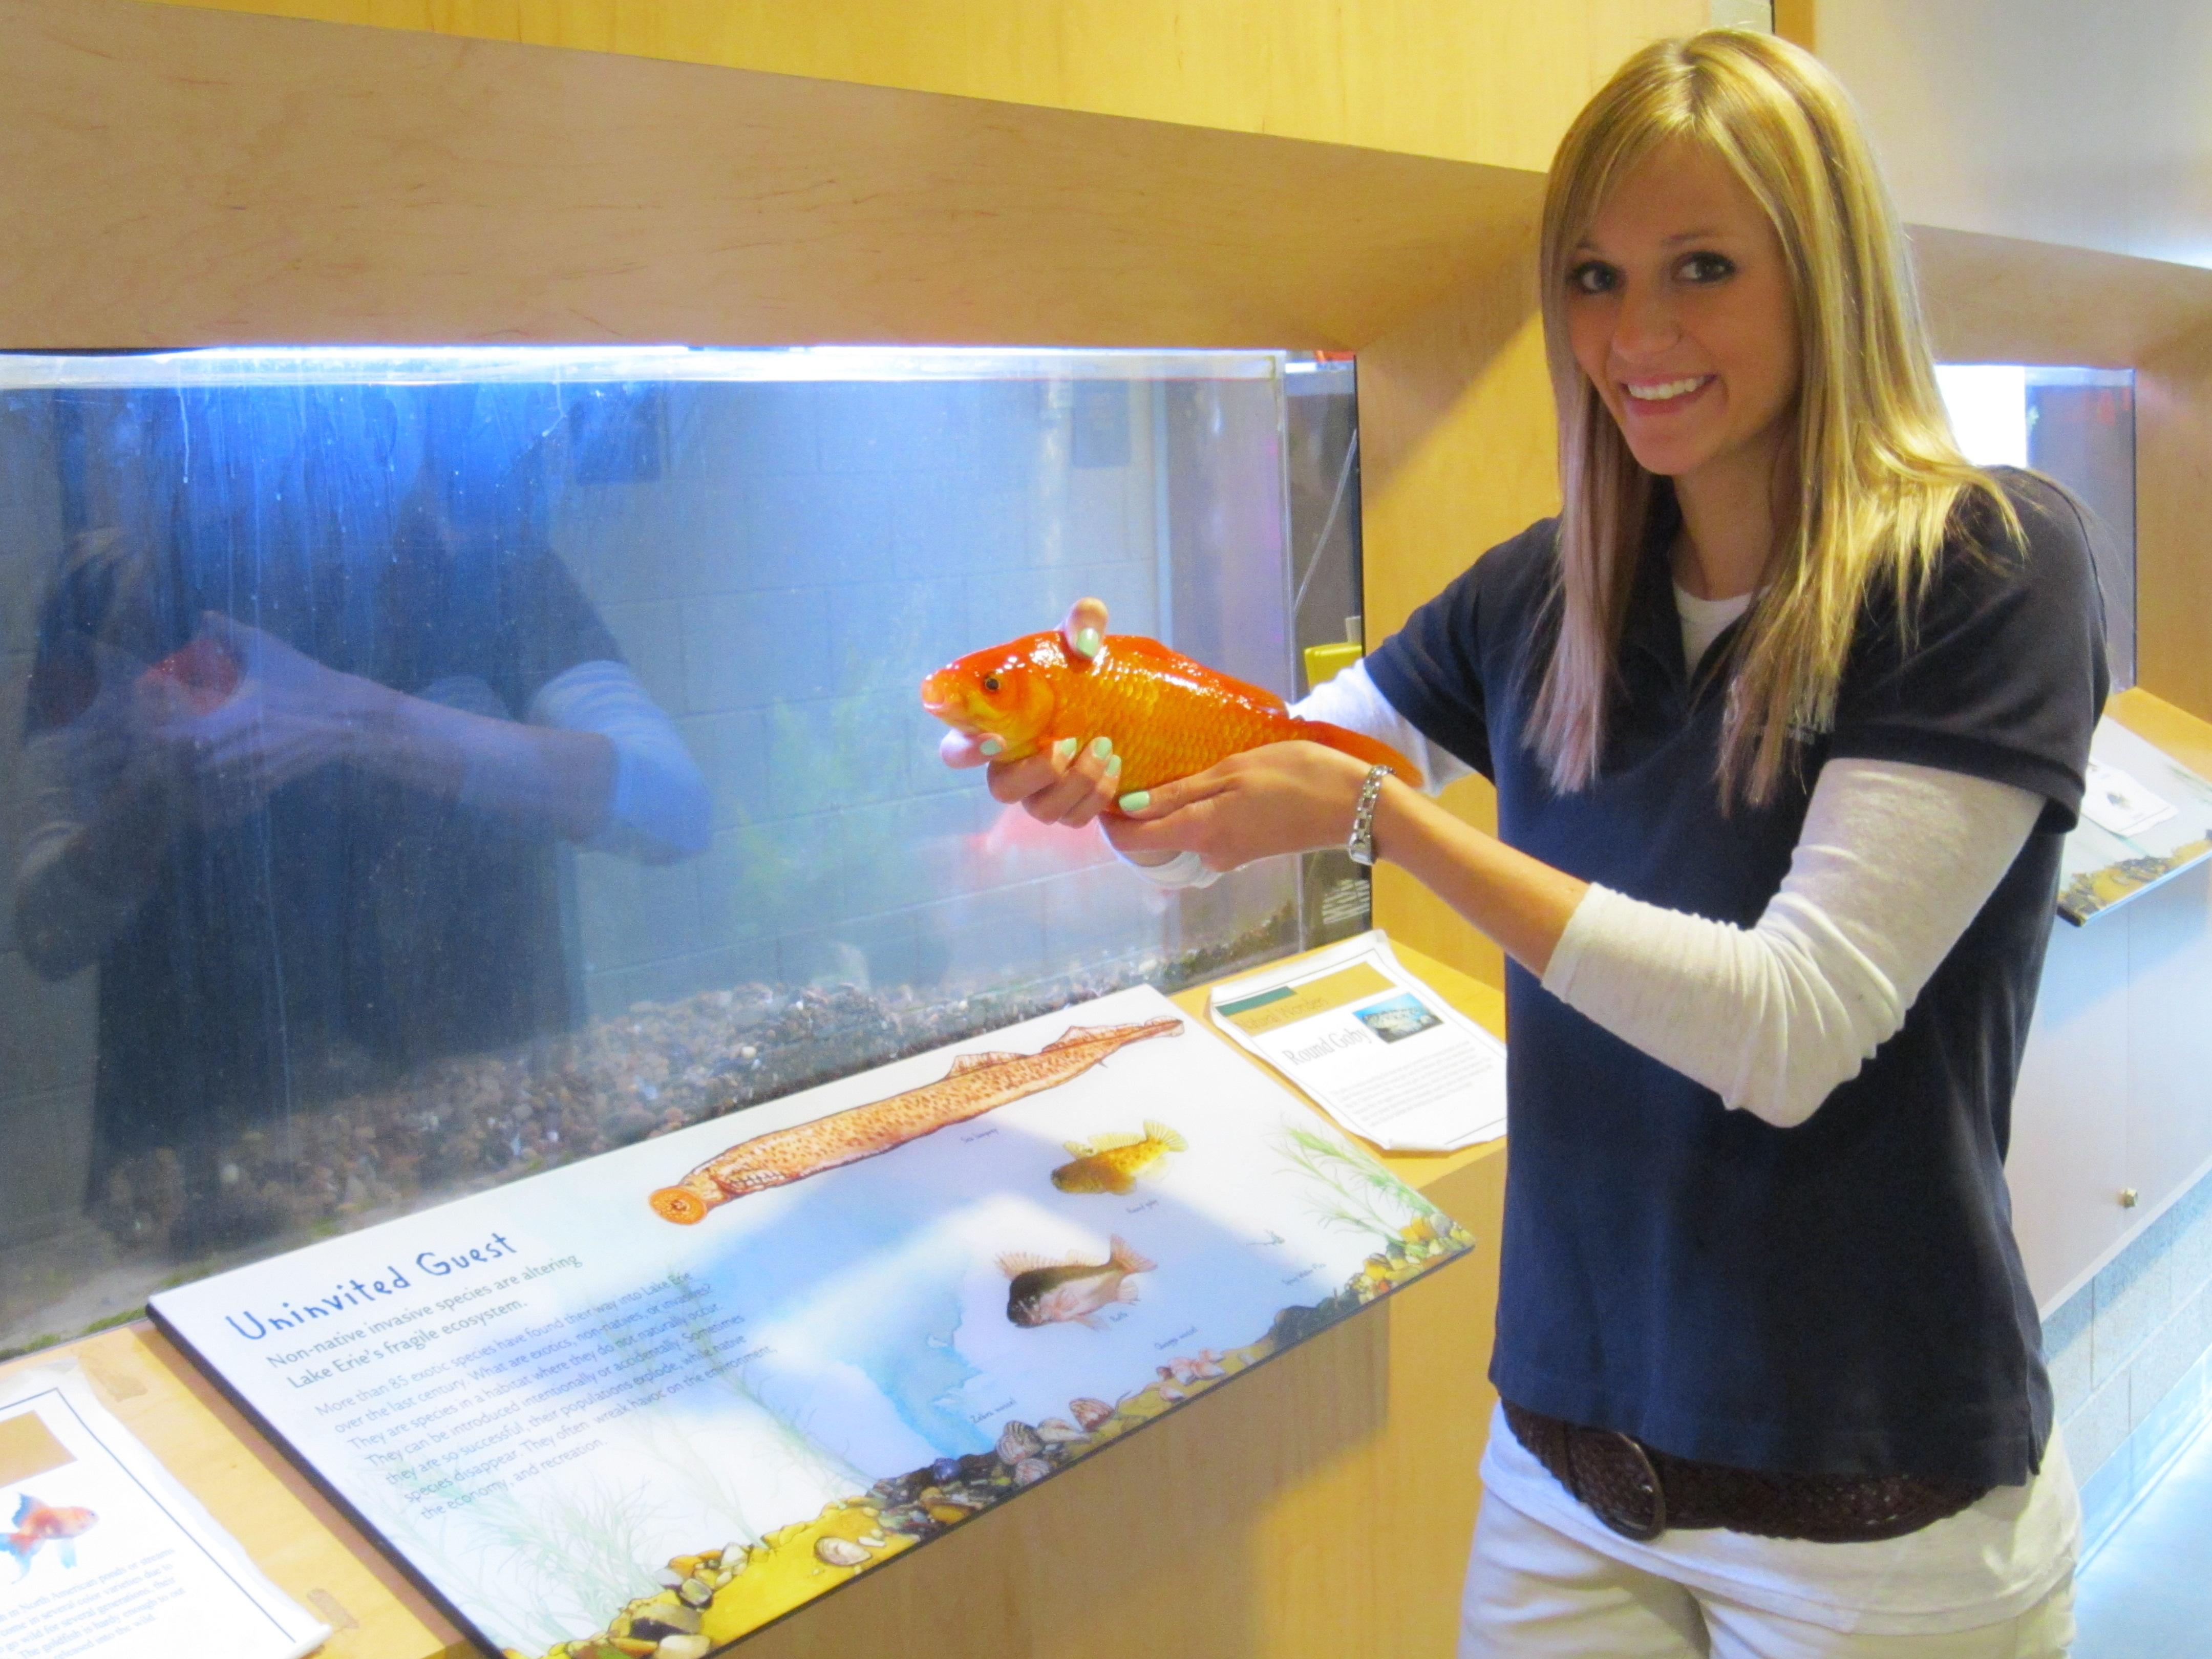 Sara Stahlman showing a goldfish